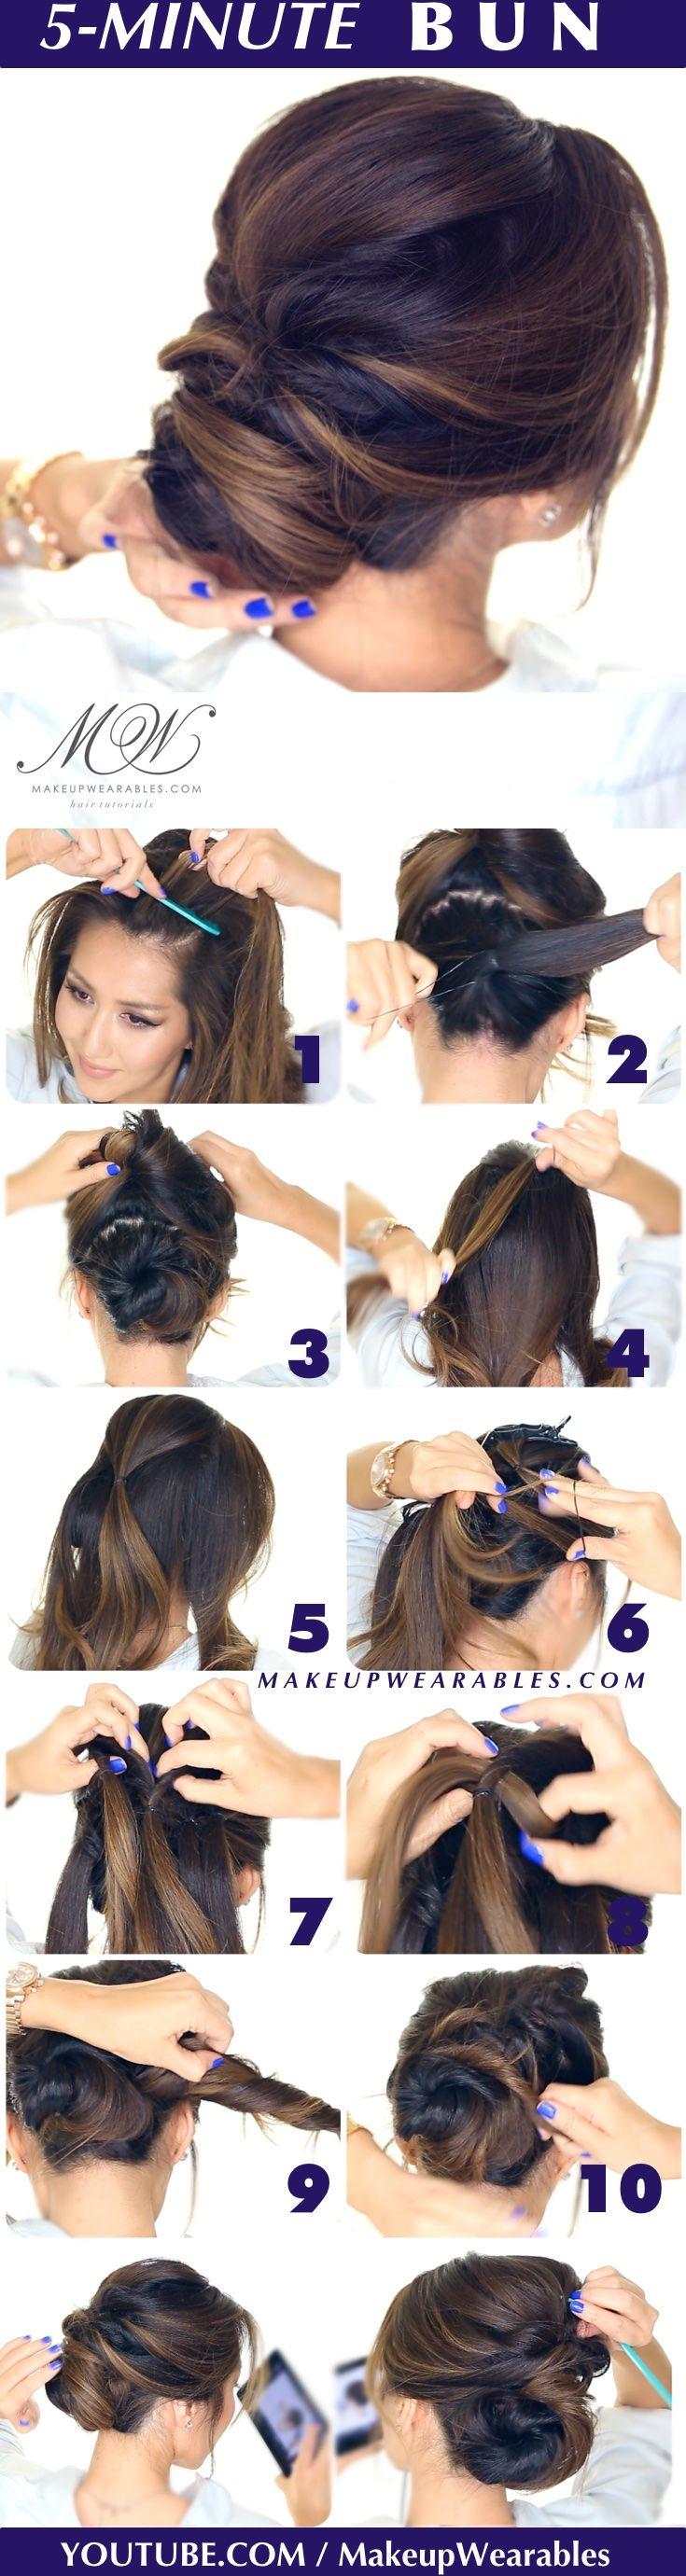 Miraculous Buns Elegant Bun And Bun Hairstyles On Pinterest Hairstyles For Women Draintrainus